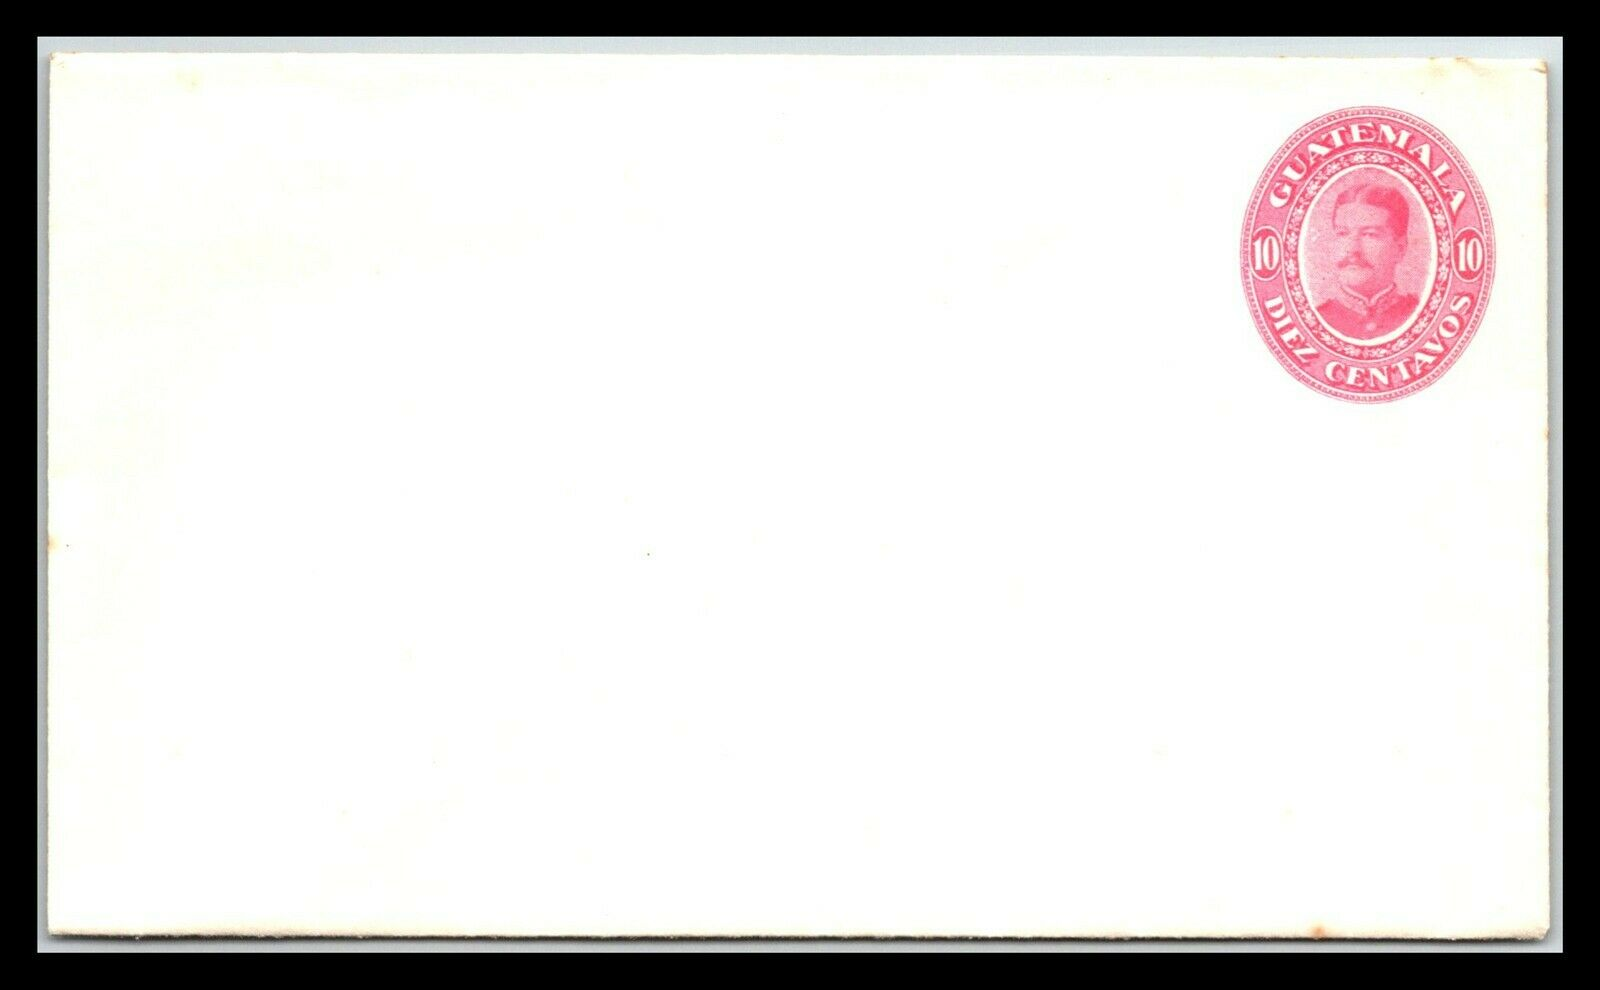 GP GOLDPATH GUATEMALA POSTAL STATIONARY MINT CV743 P01 - $76.00